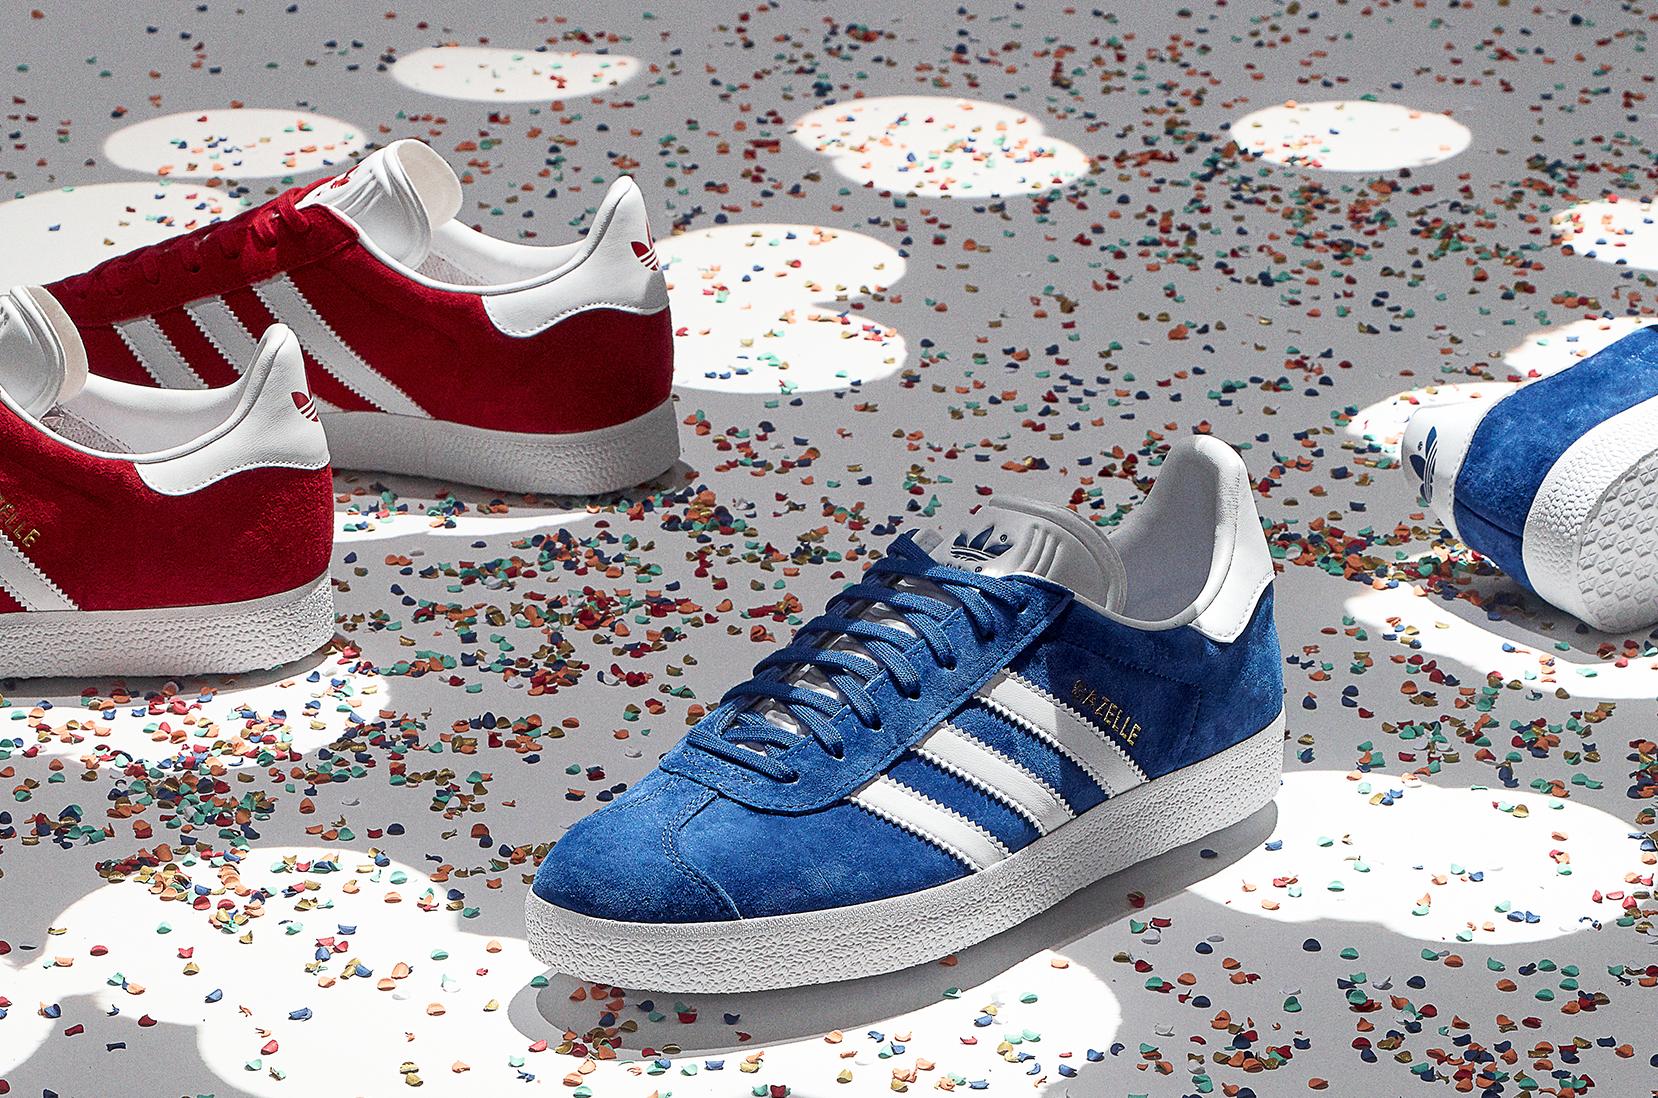 3105d169a08 adidas Originals Gazelle rood adidas Originals Gazelle blauw